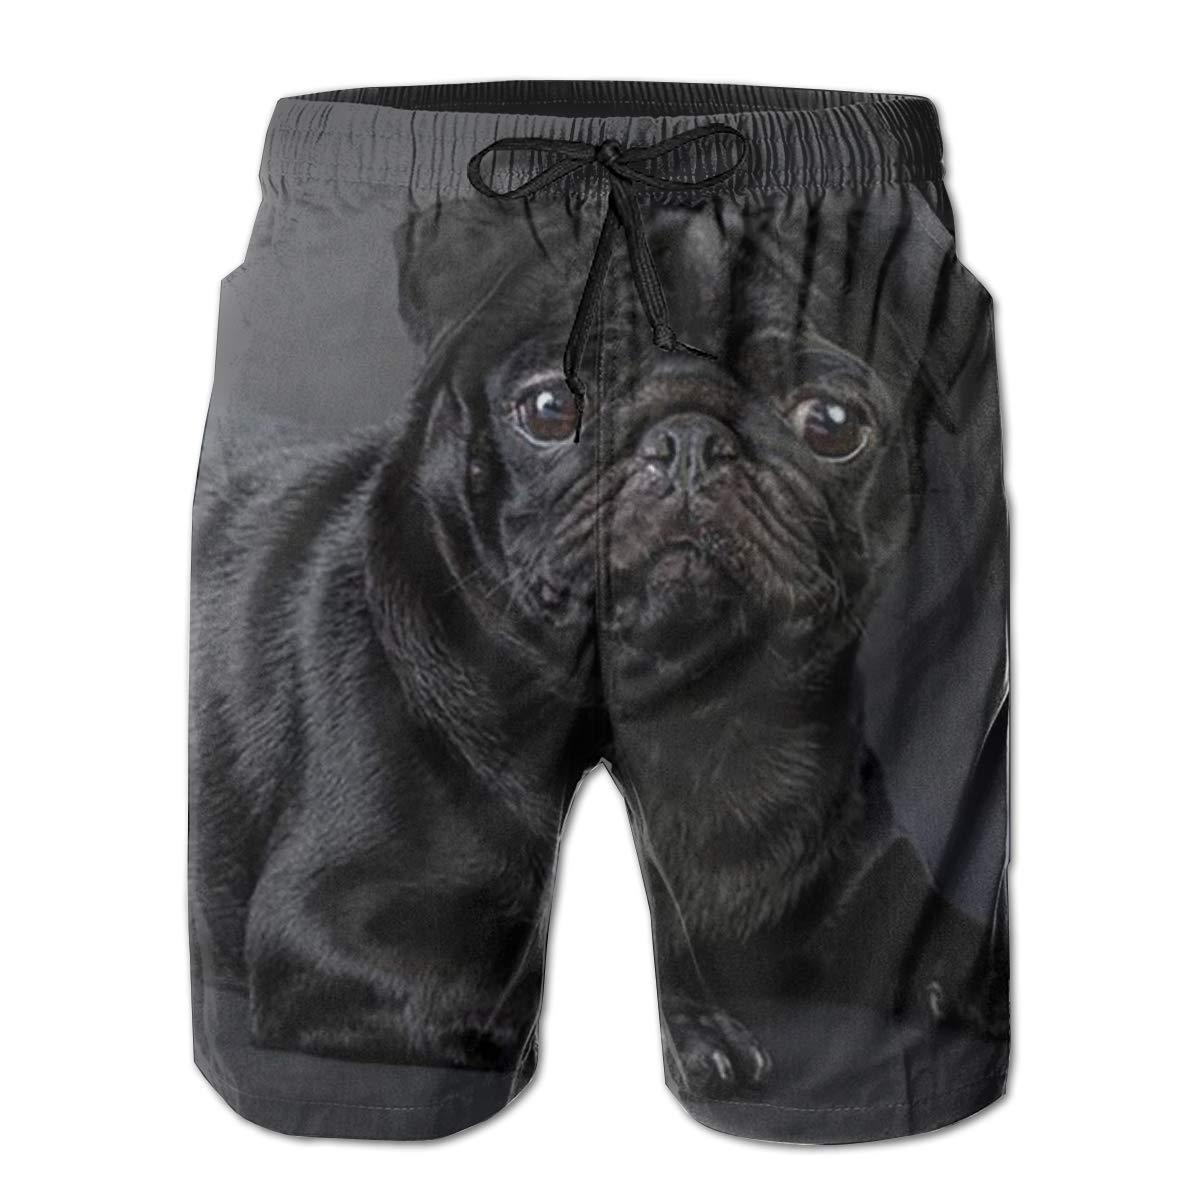 Mens Swim Trunks Black Pug Beach Board Shorts Quick Dry Sports Running Swim Board Shorts with Pockets Mesh Lining